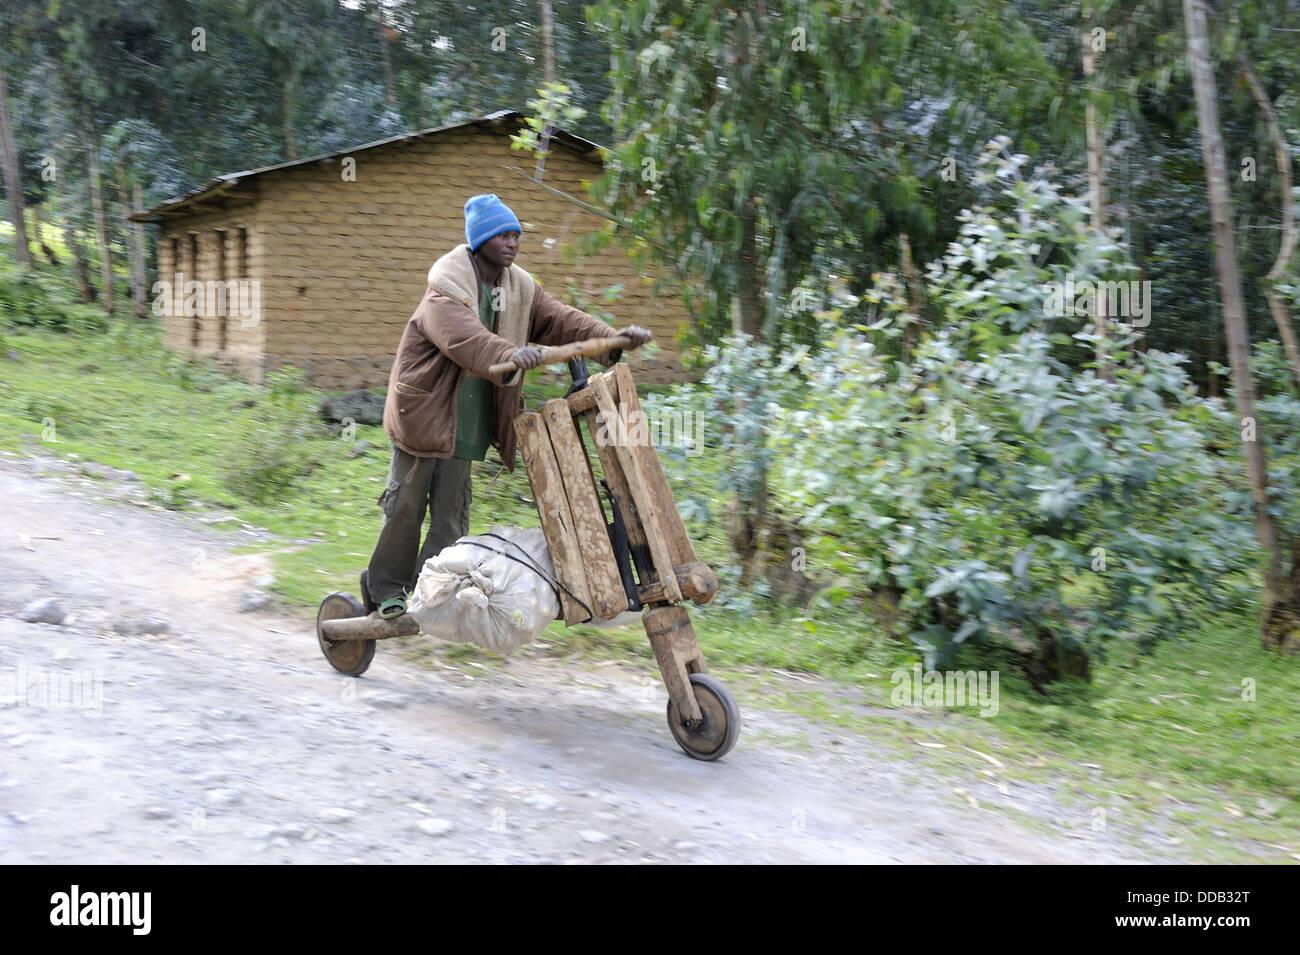 Man on hand made wooden bicycle, Rwanda, Africa - Stock Image